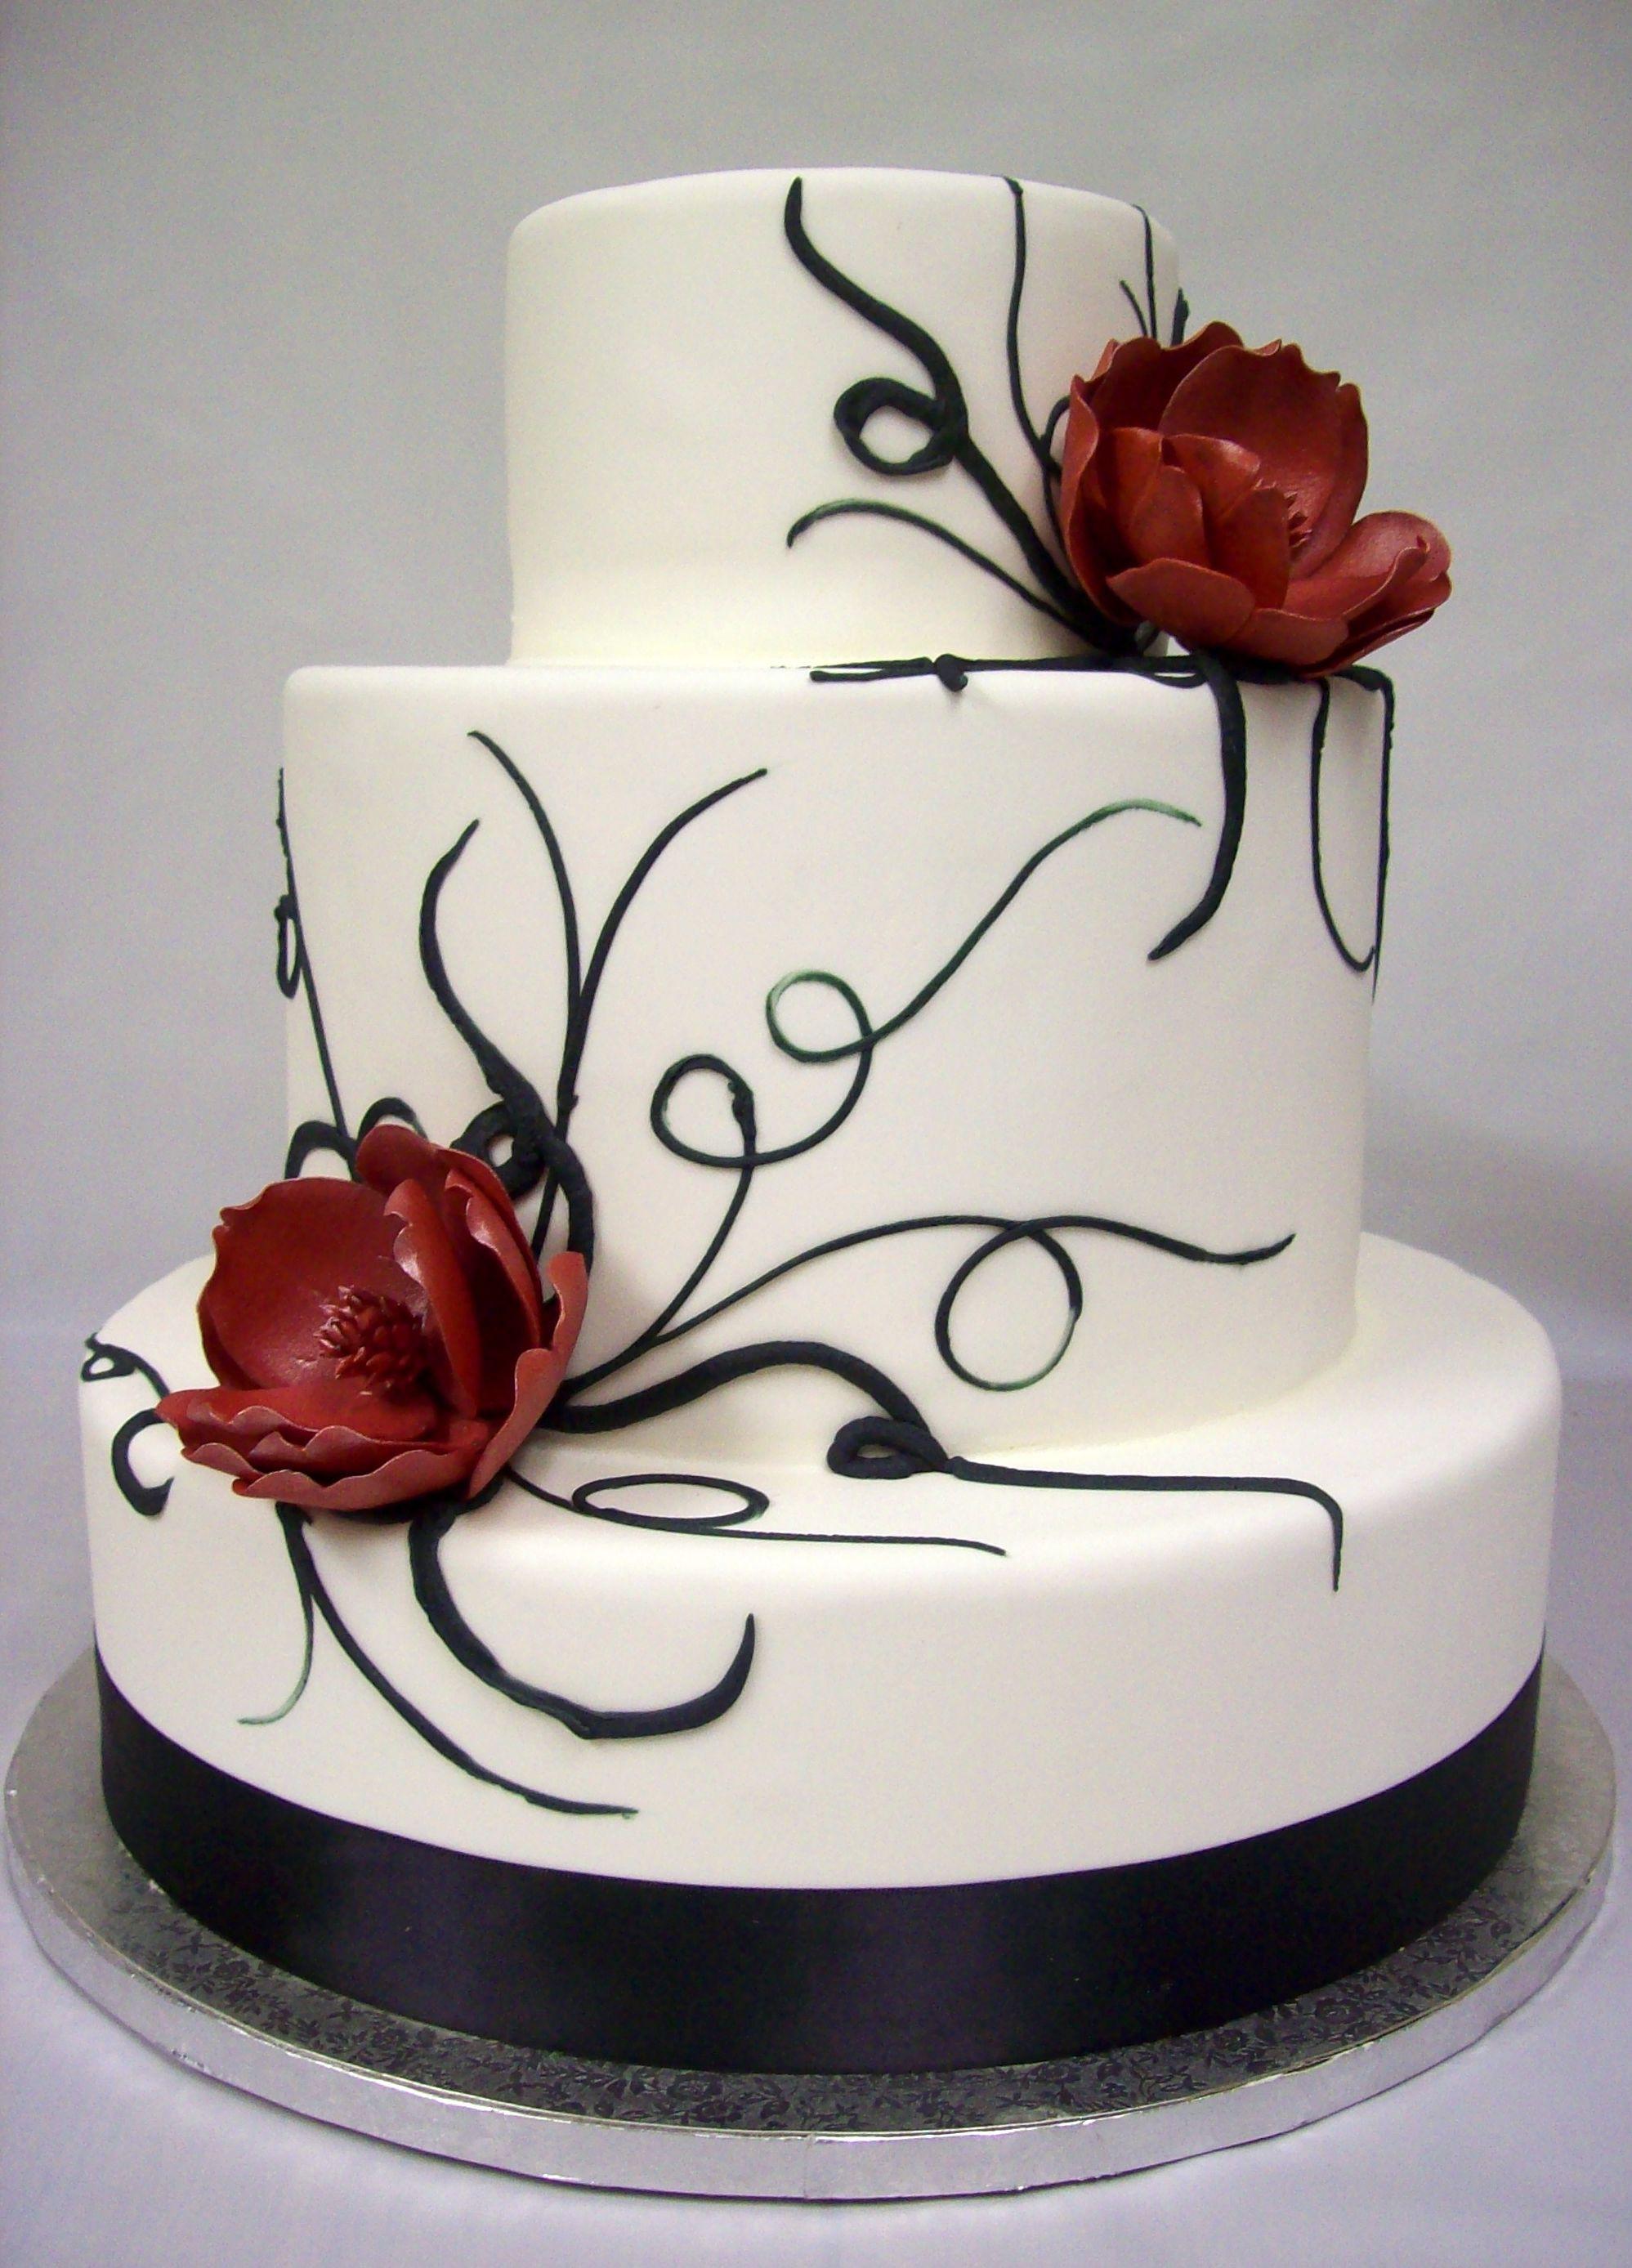 Black And White Cake  Black And White Wedding Cakes